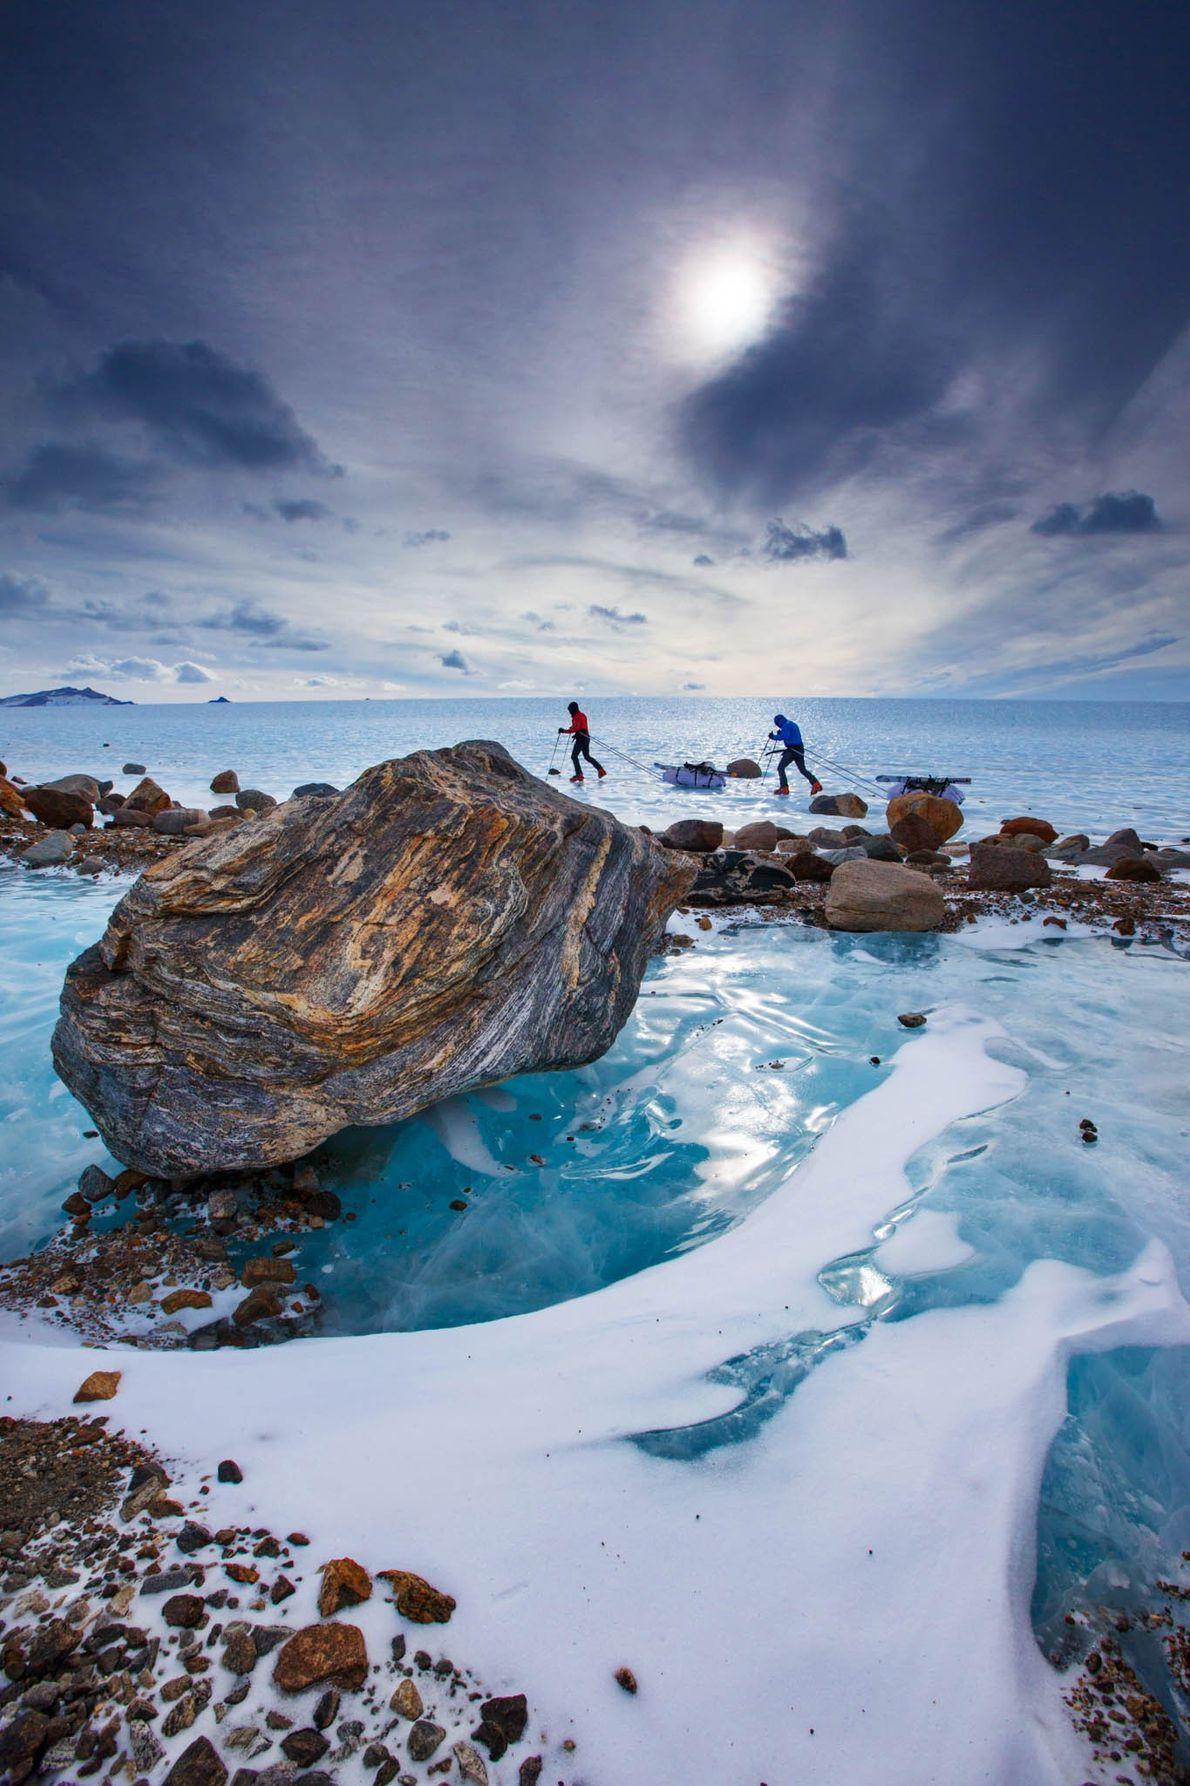 Antarctic travelers trek through a glacial blue landscape in Queen Maud Land.